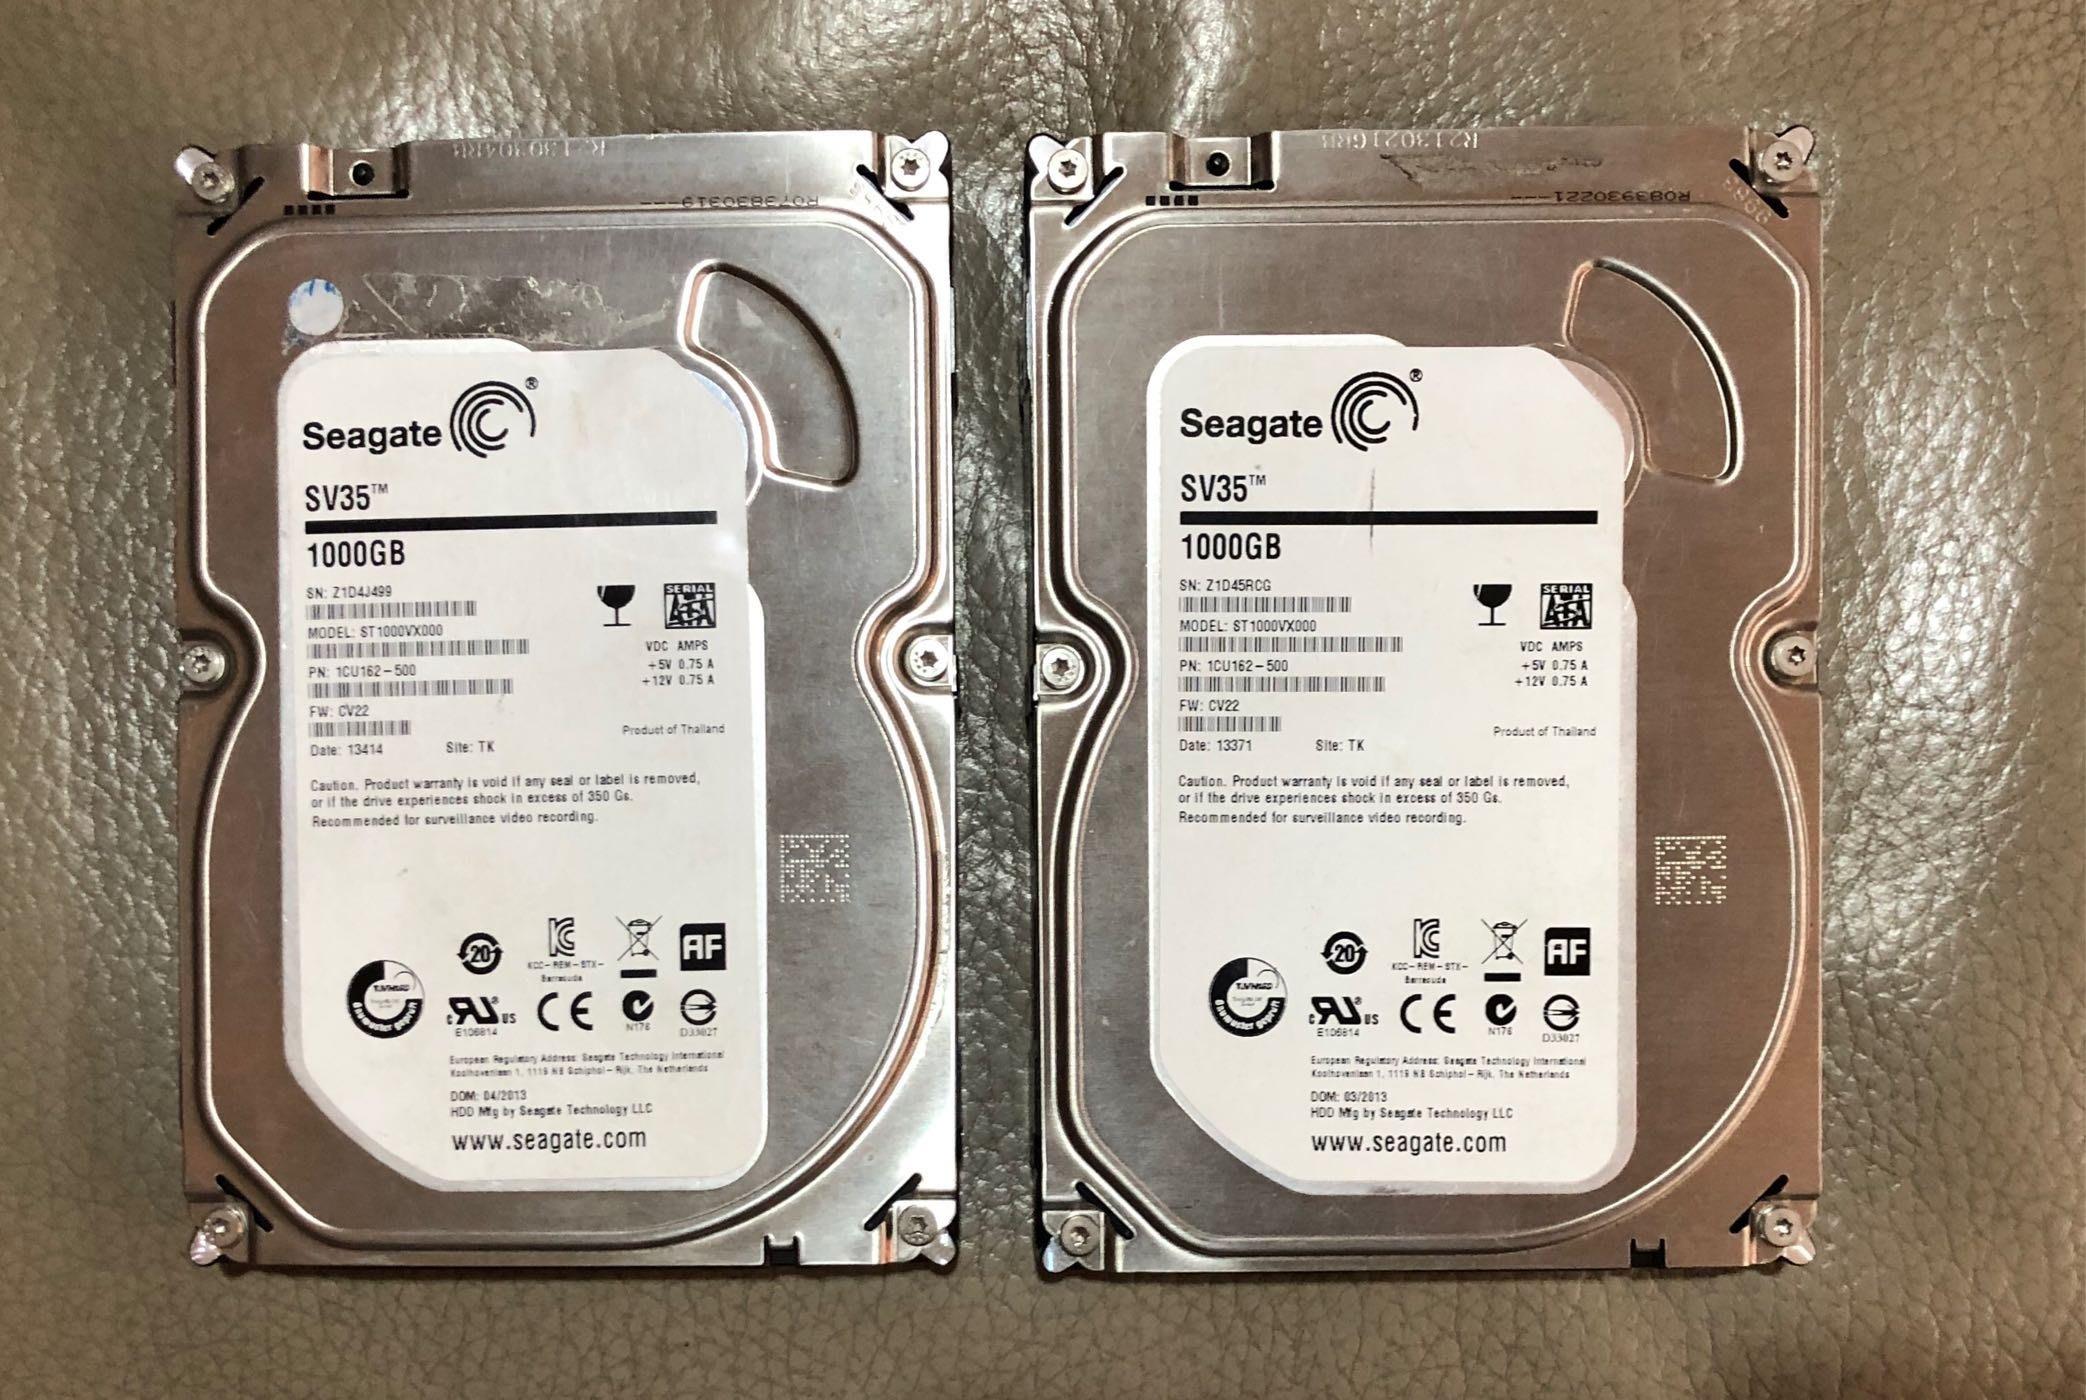 SEAGATE 1T 1TB 3.5吋 7200轉 硬碟 三重自取一顆300元 非2T/3T/4T/6T